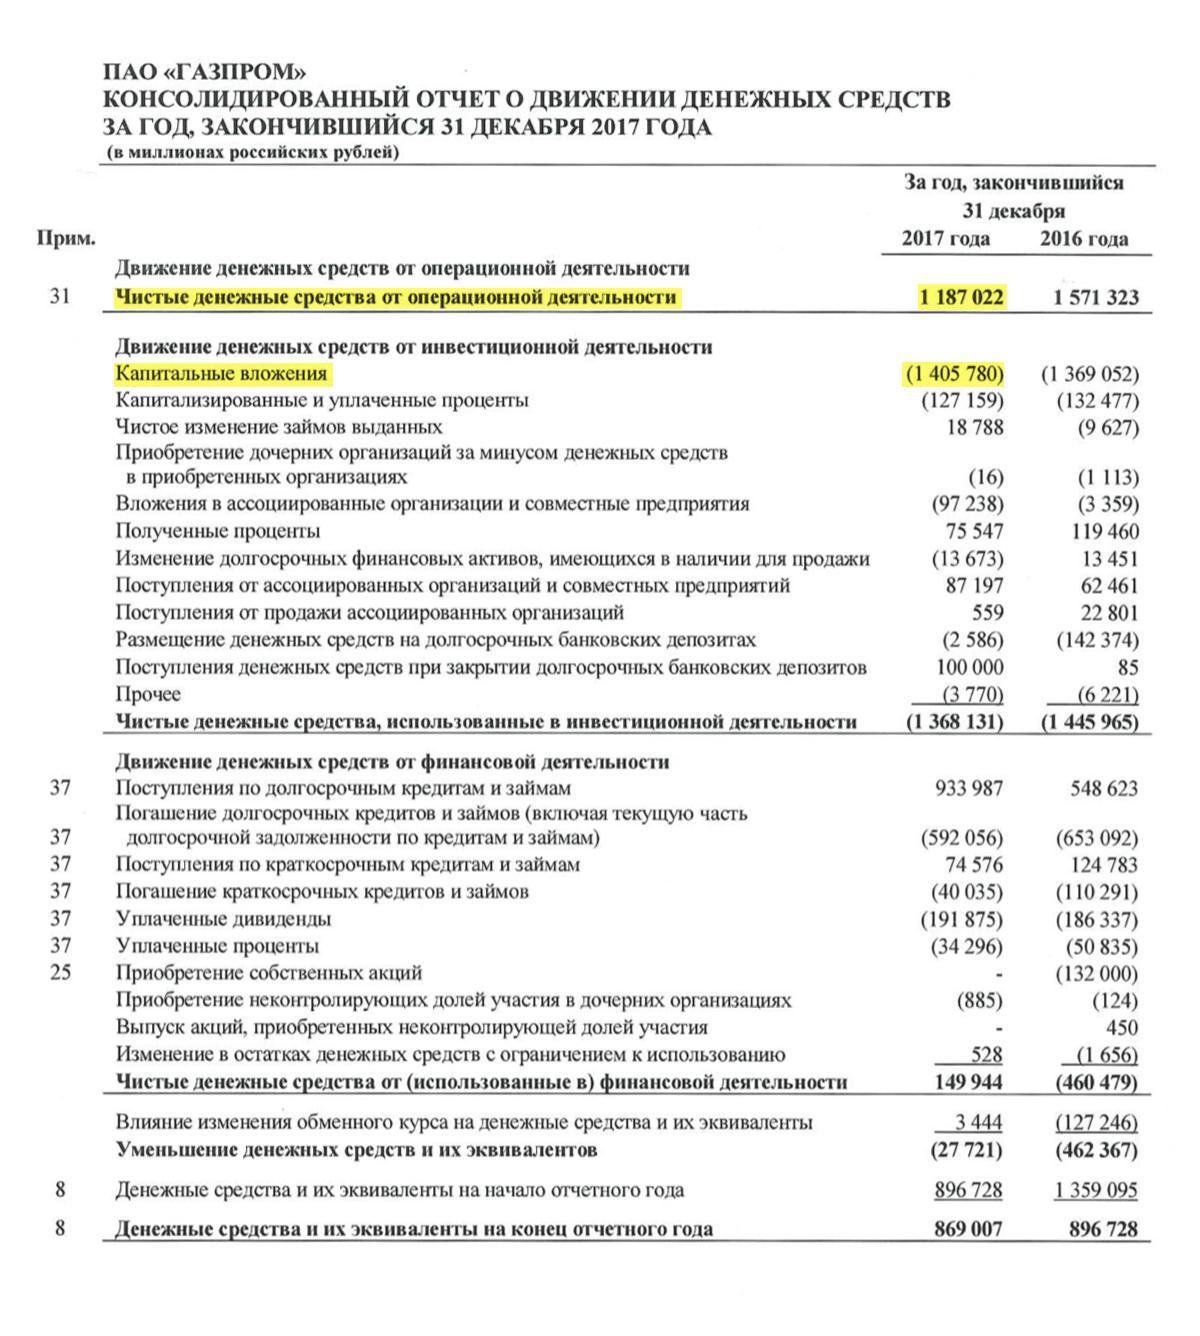 Страница 10 отчета «Газпрома» за 2017 год